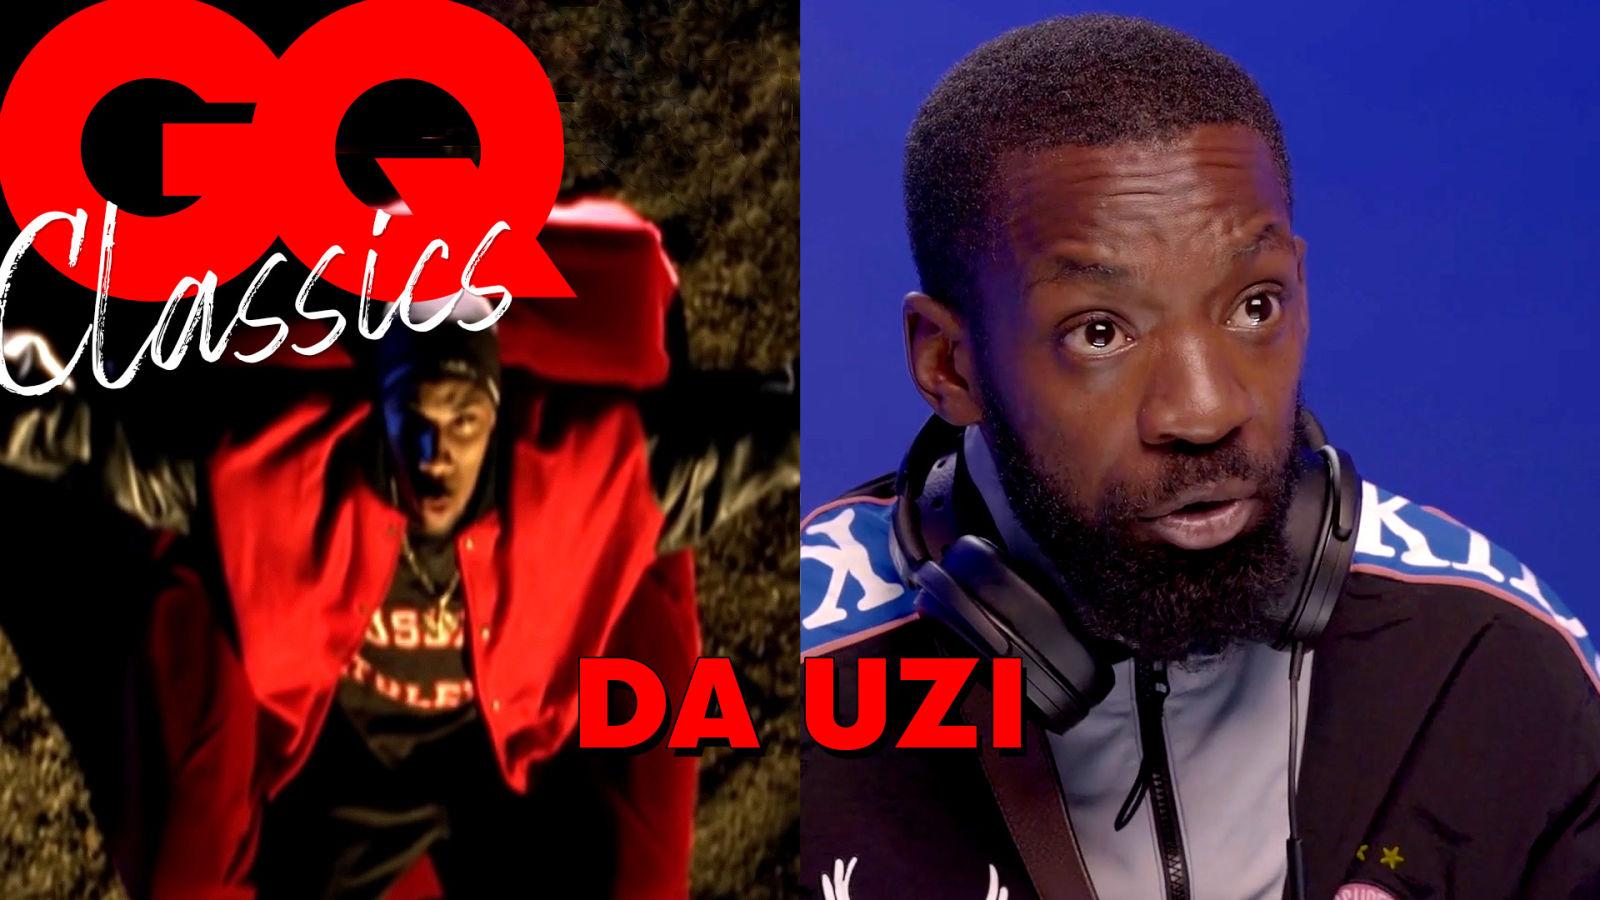 DA Uzi juge les classiques du rap français : Mac Tyer, Busta Flex, Fonky Family, Diam's